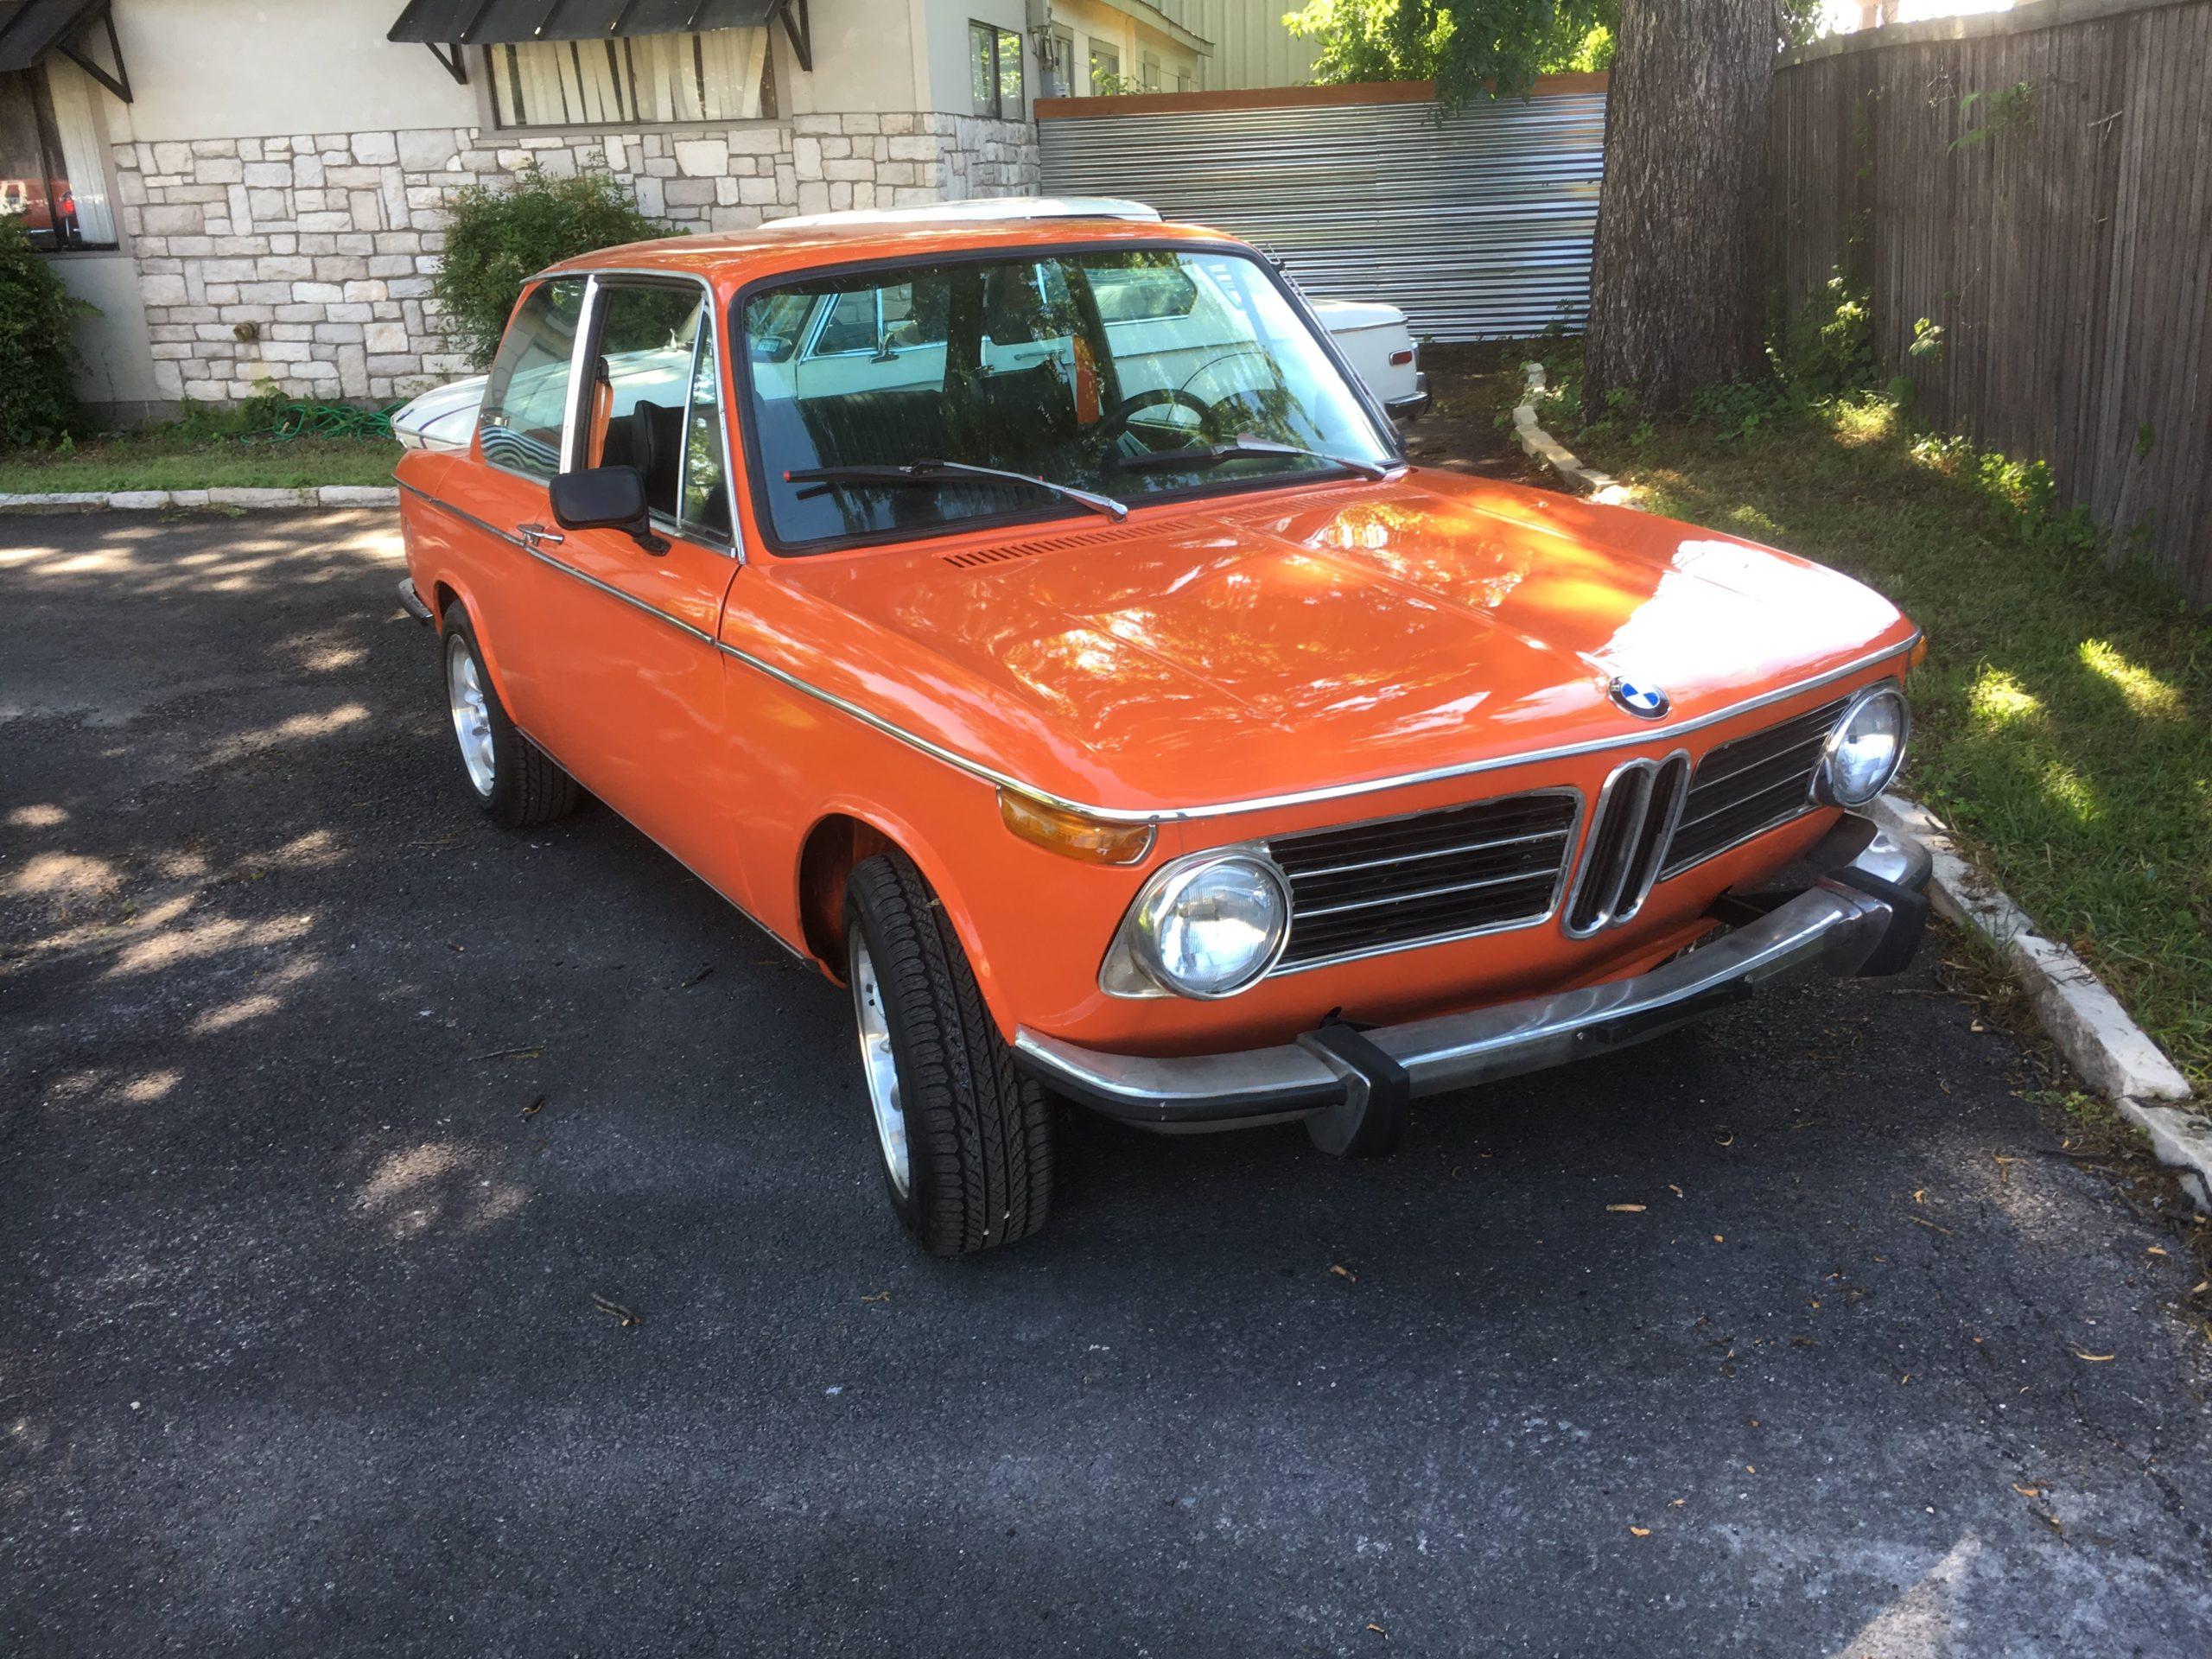 1973 BMW 2002 (Inka Orange) full